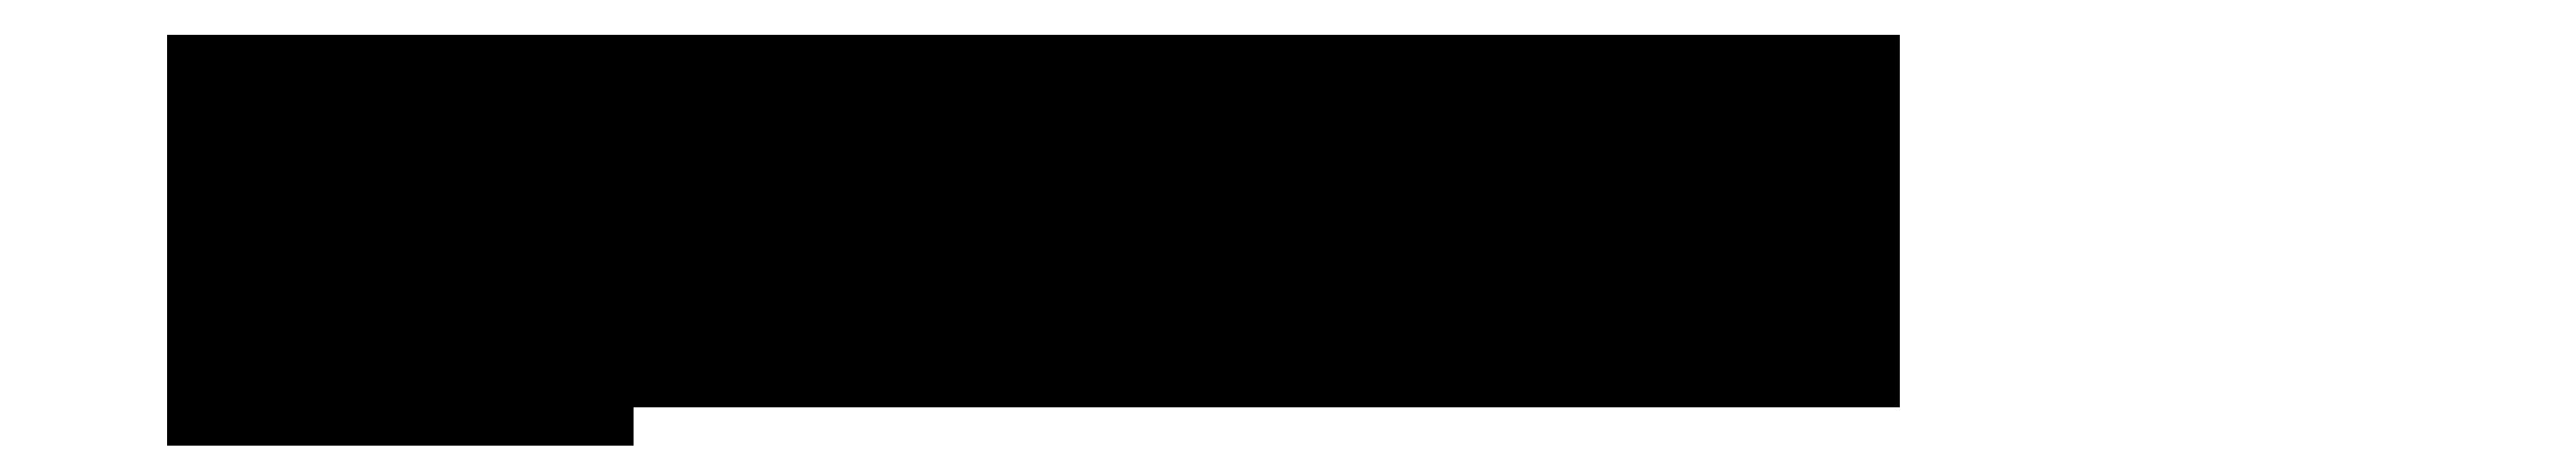 Typeface-Heimat-Sans-F02-Atlas-Font-Foundry